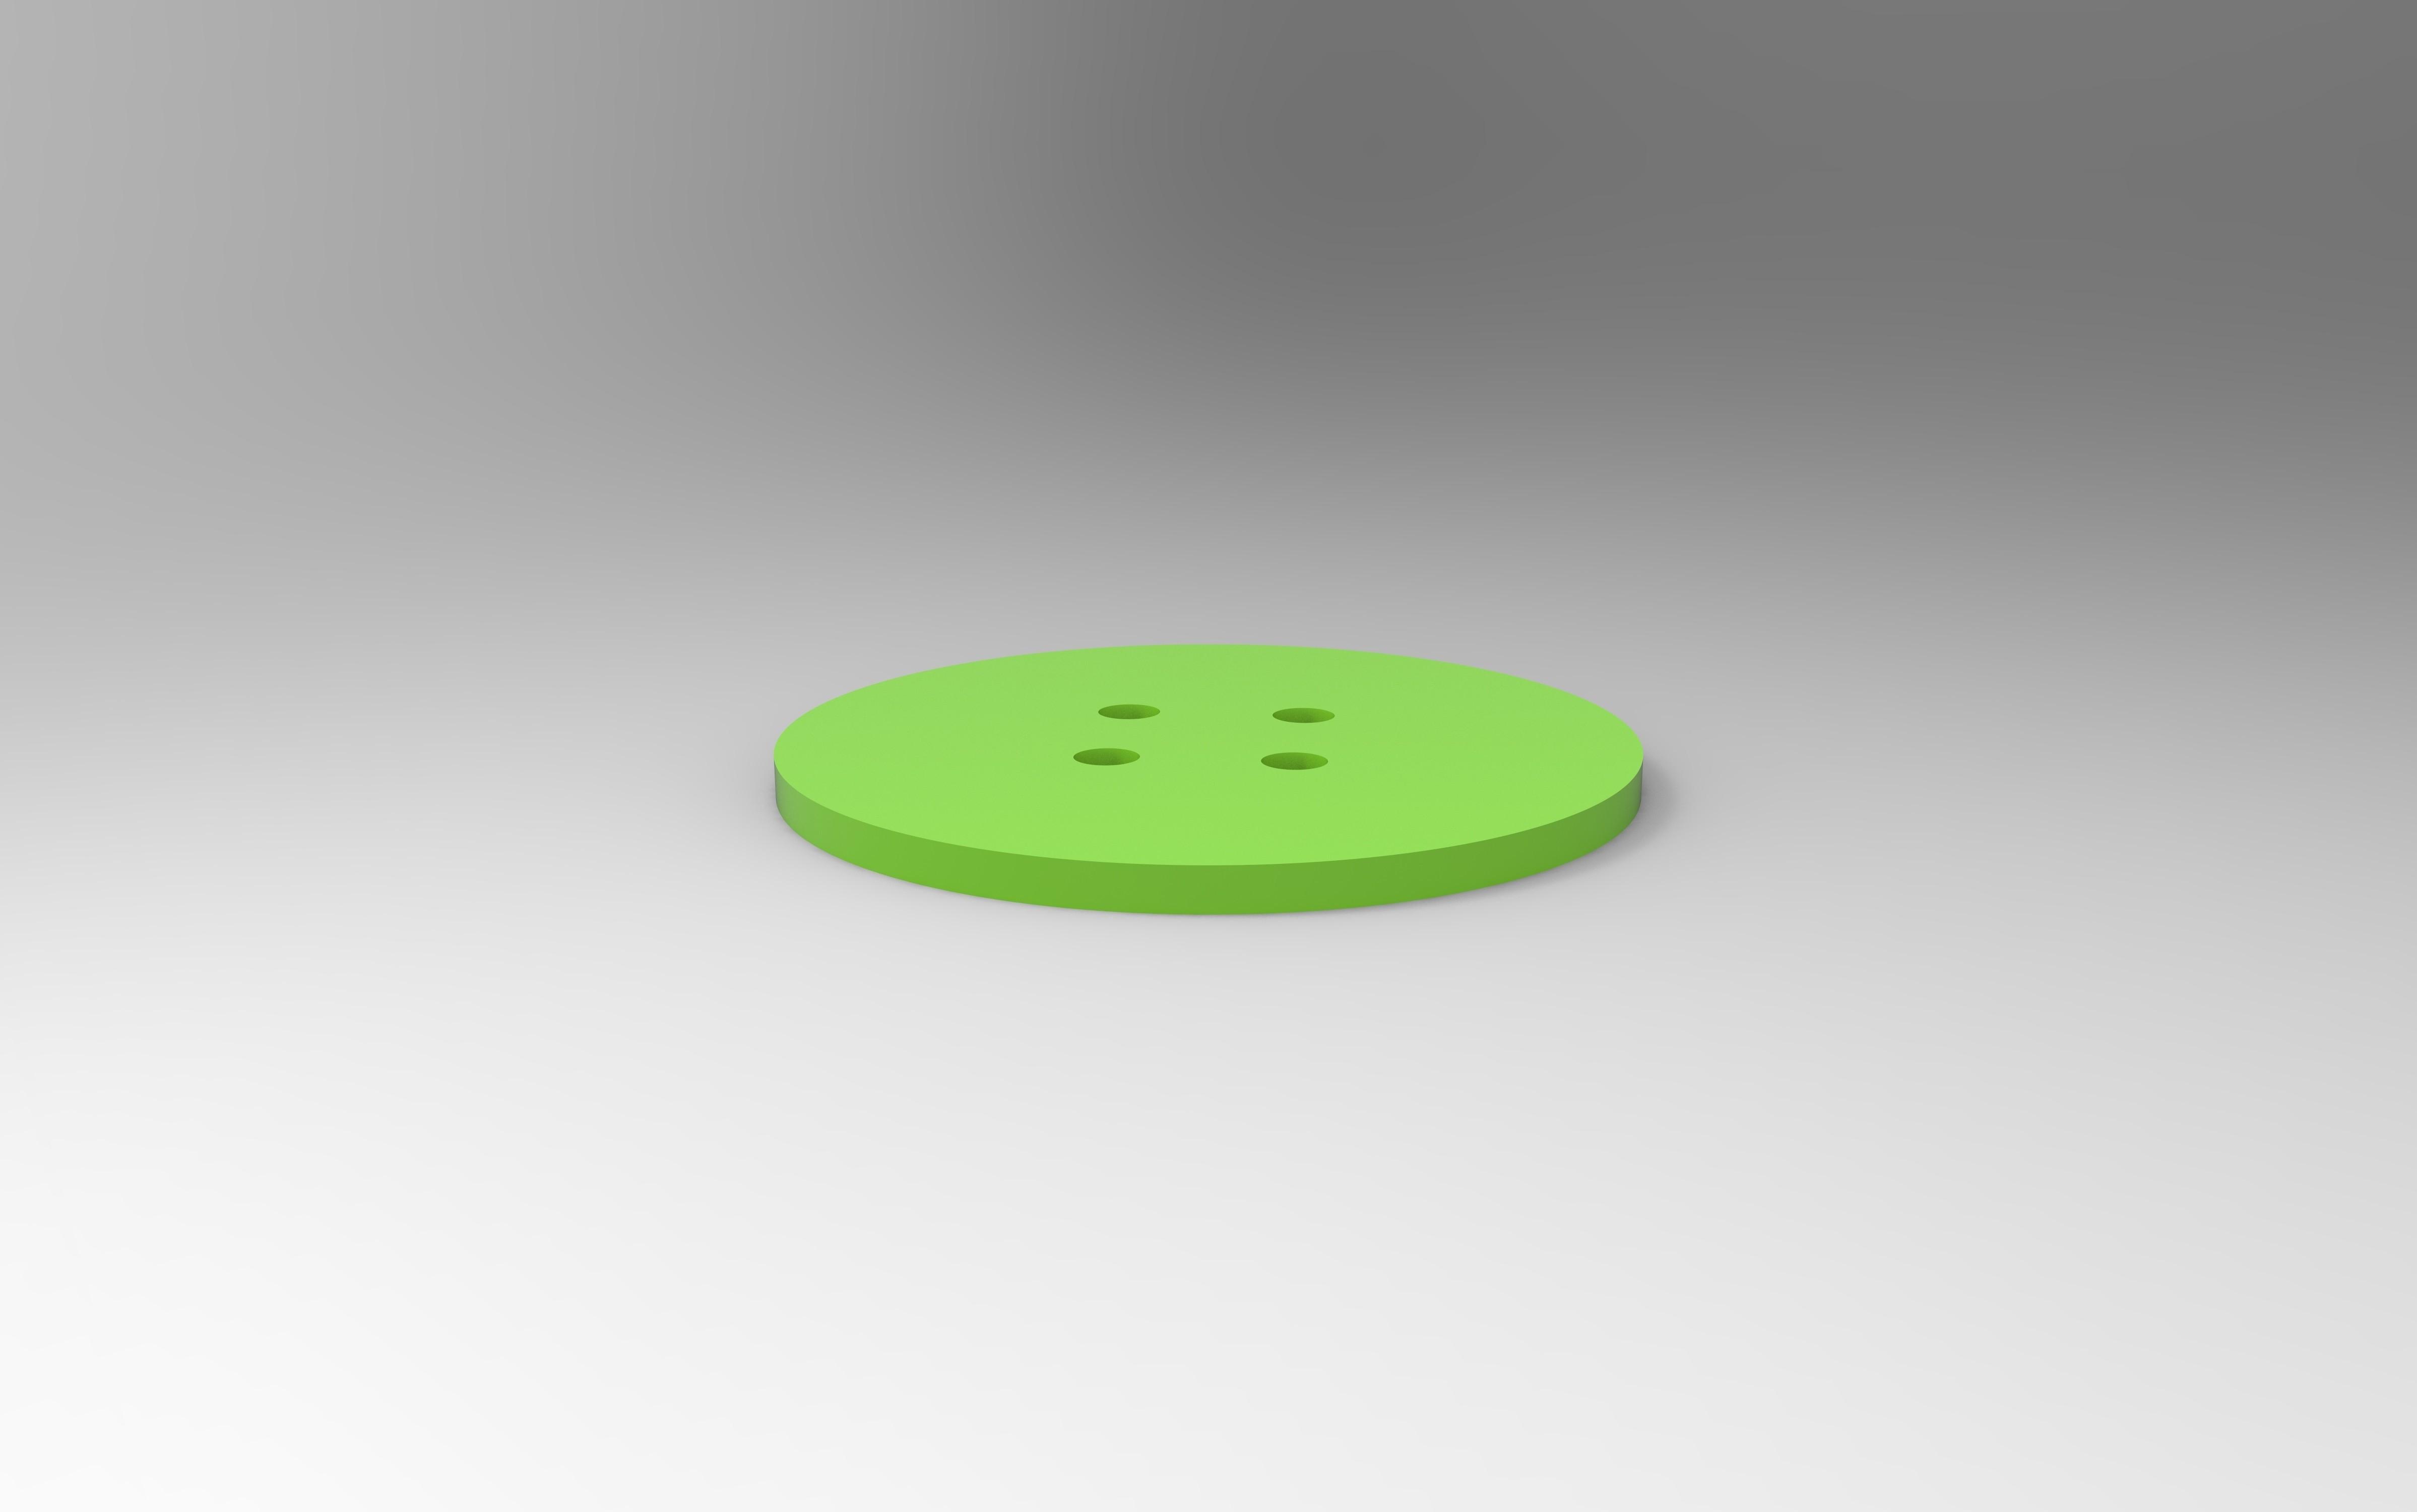 rendu simple vert avec tasse.jpg Download free STL file Cup mats • 3D print design, GuilhemPerroud